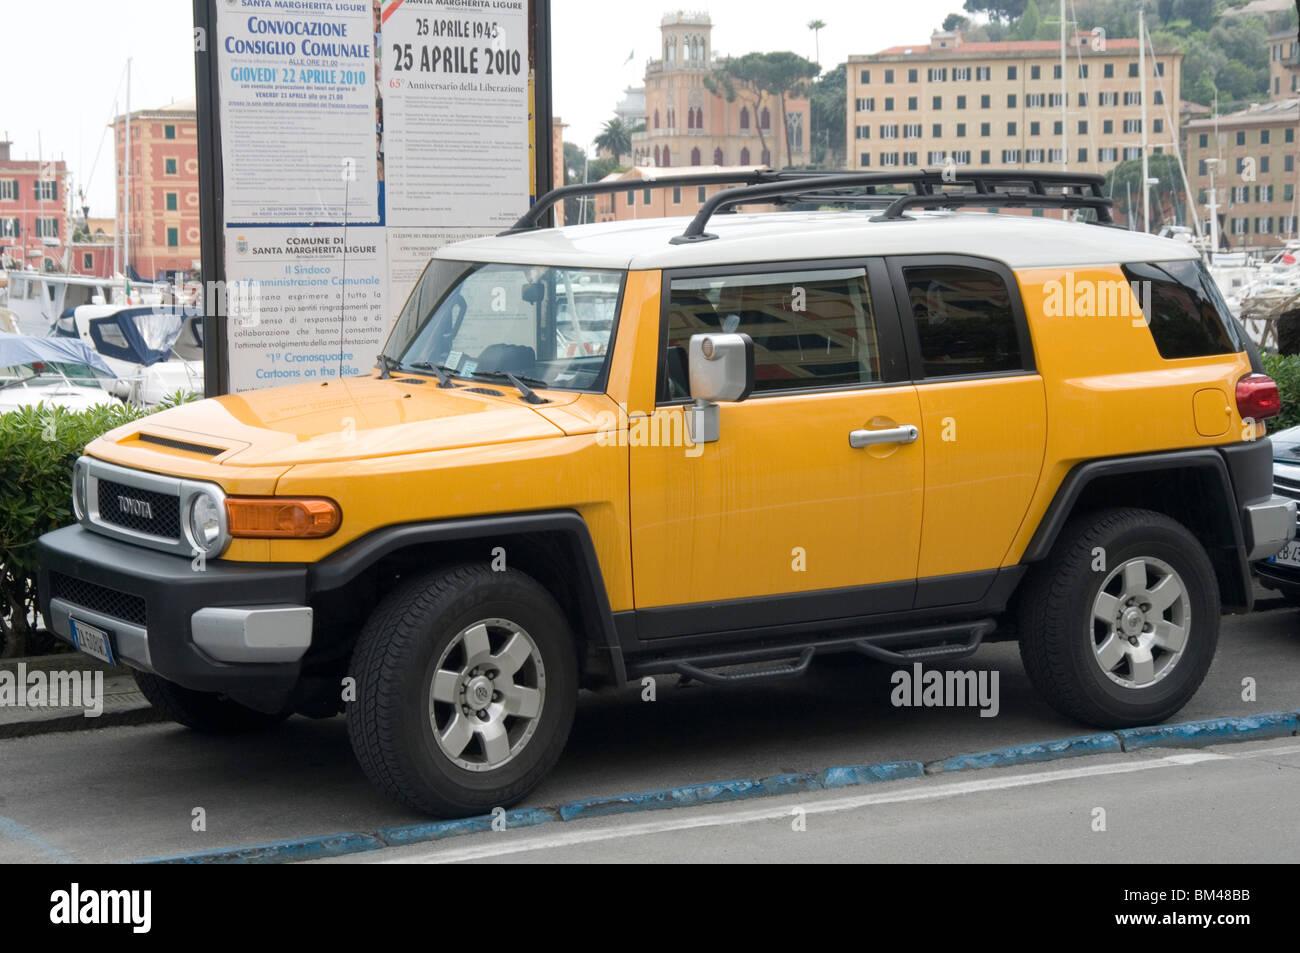 fa5a4b8582 Toyota Land Cruiser offroader carretera vehículo utilitario deportivo suv 4  cuatro por 4X4 robusto estilo retro estilo de peinado chunky dura r